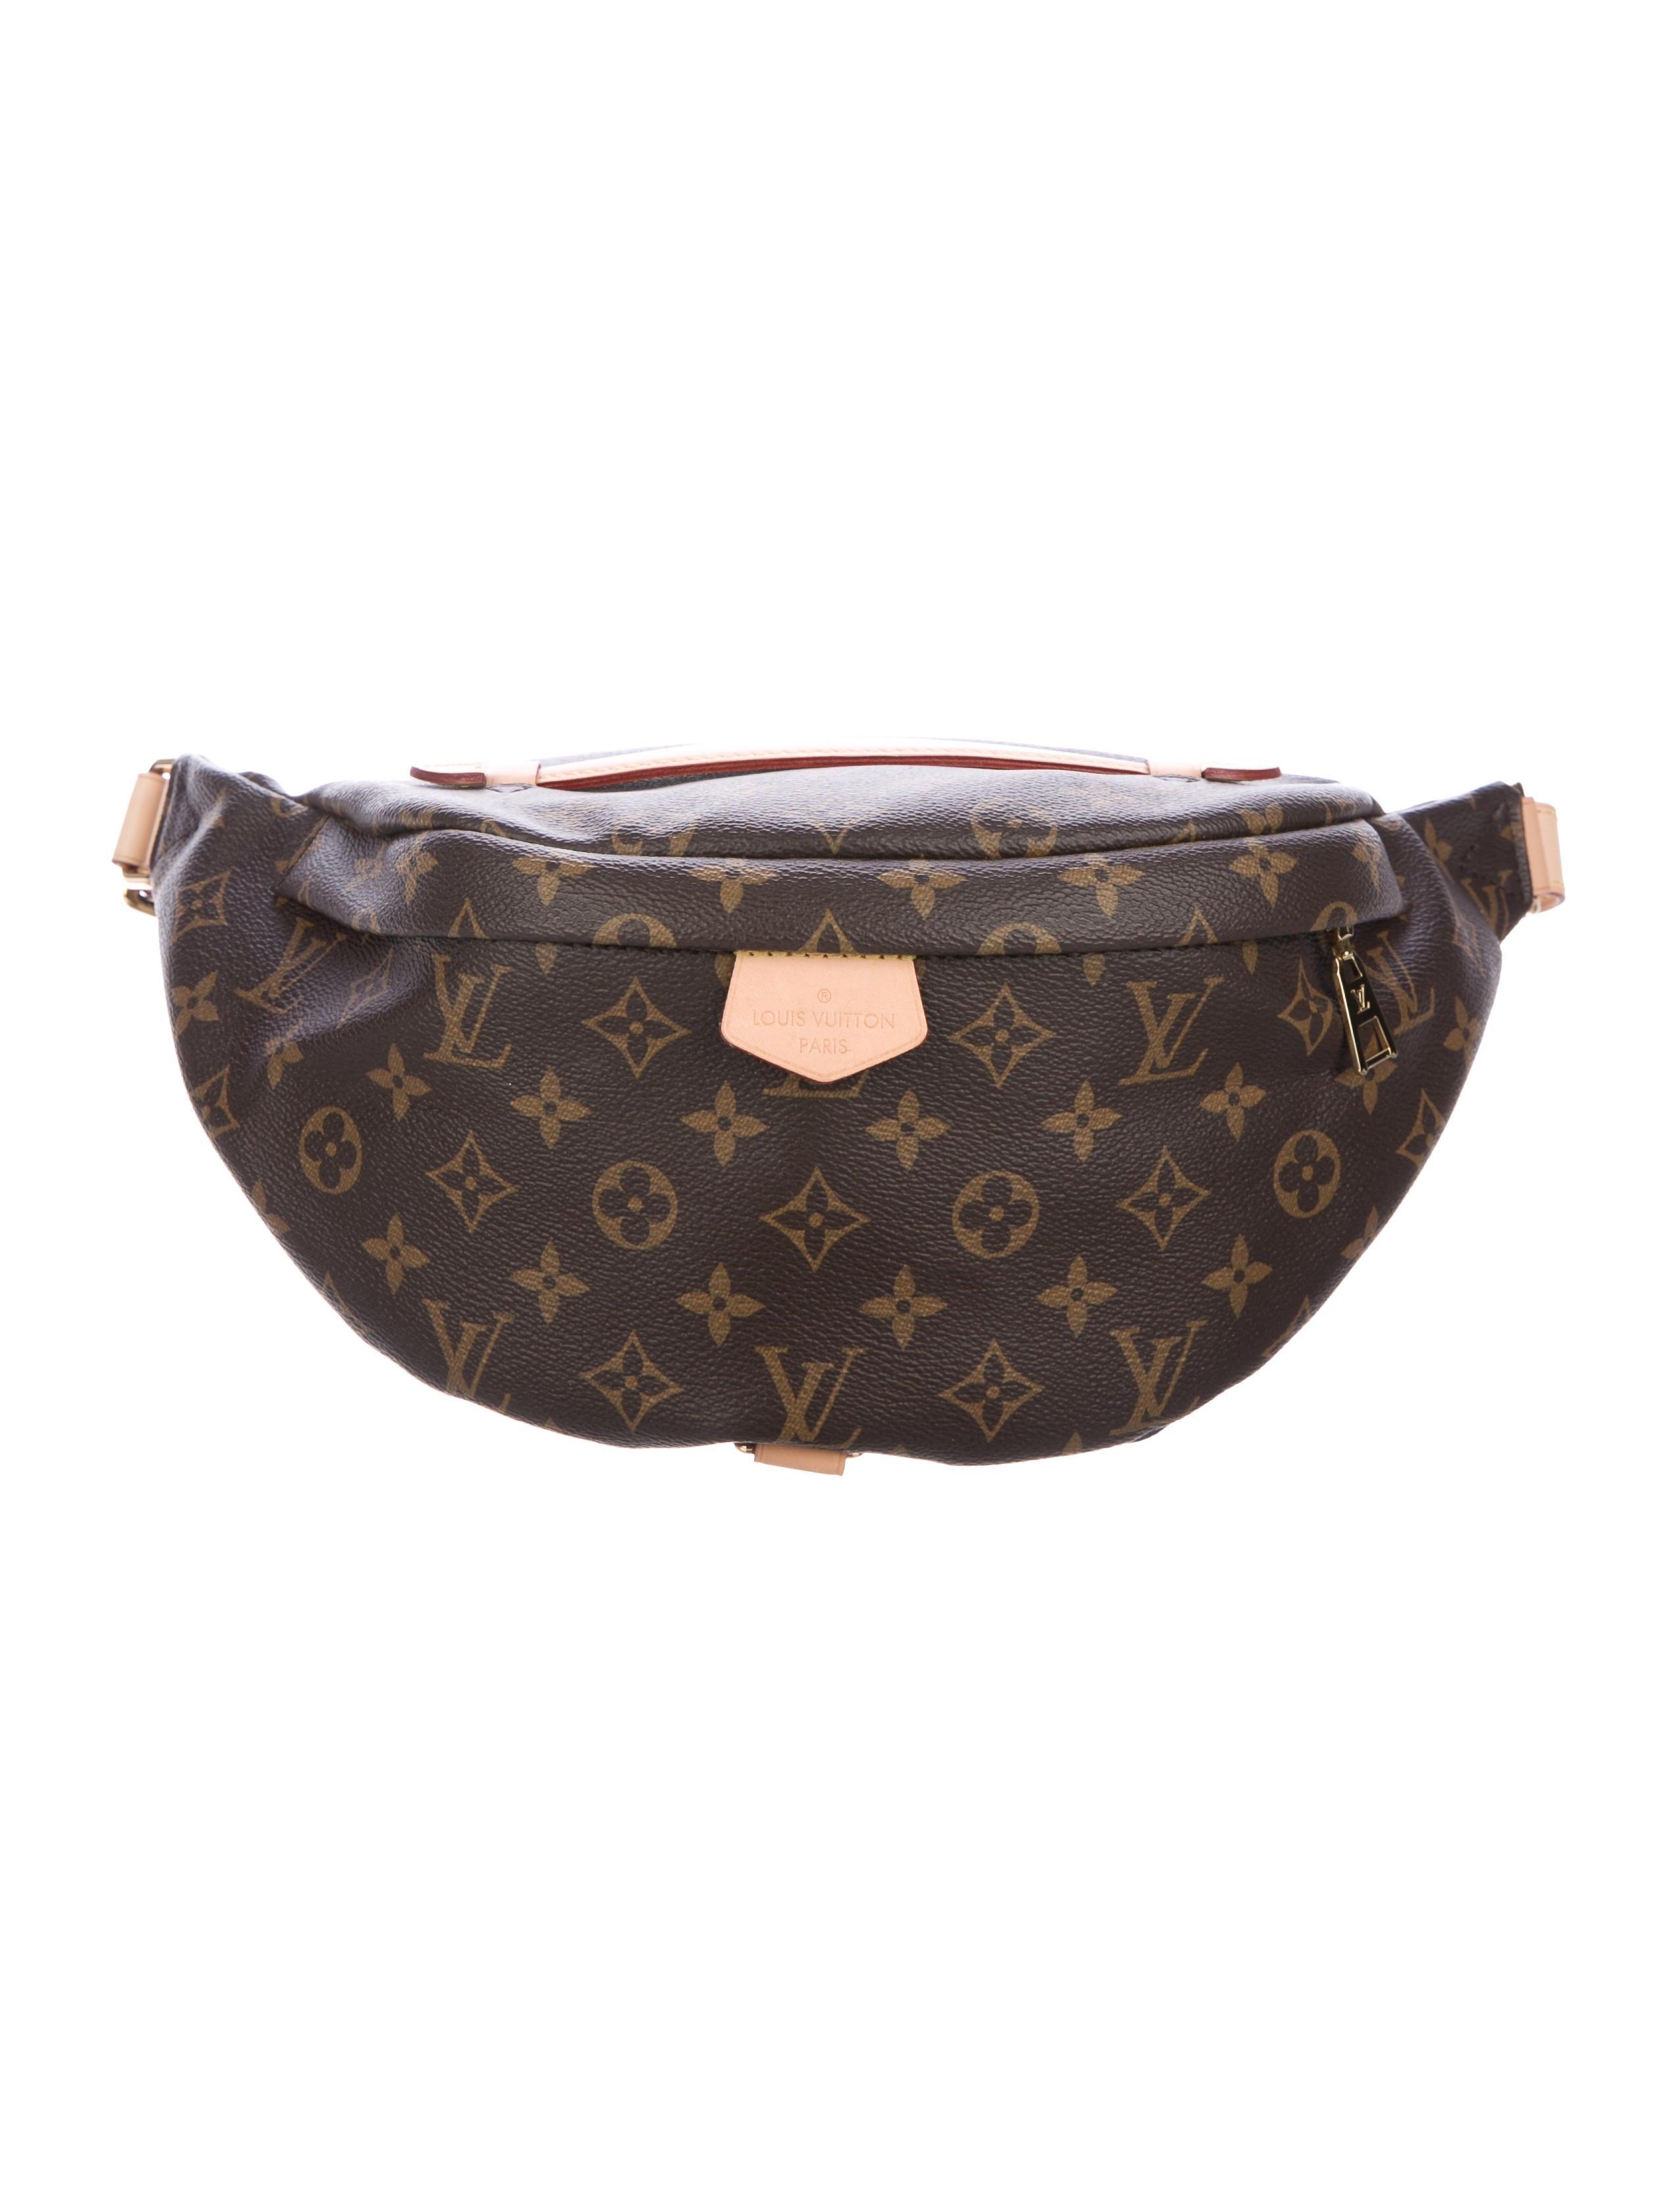 d082919b1e891 Louis Vuitton 2018 Monogram Bumbag - Bags - LOU169028